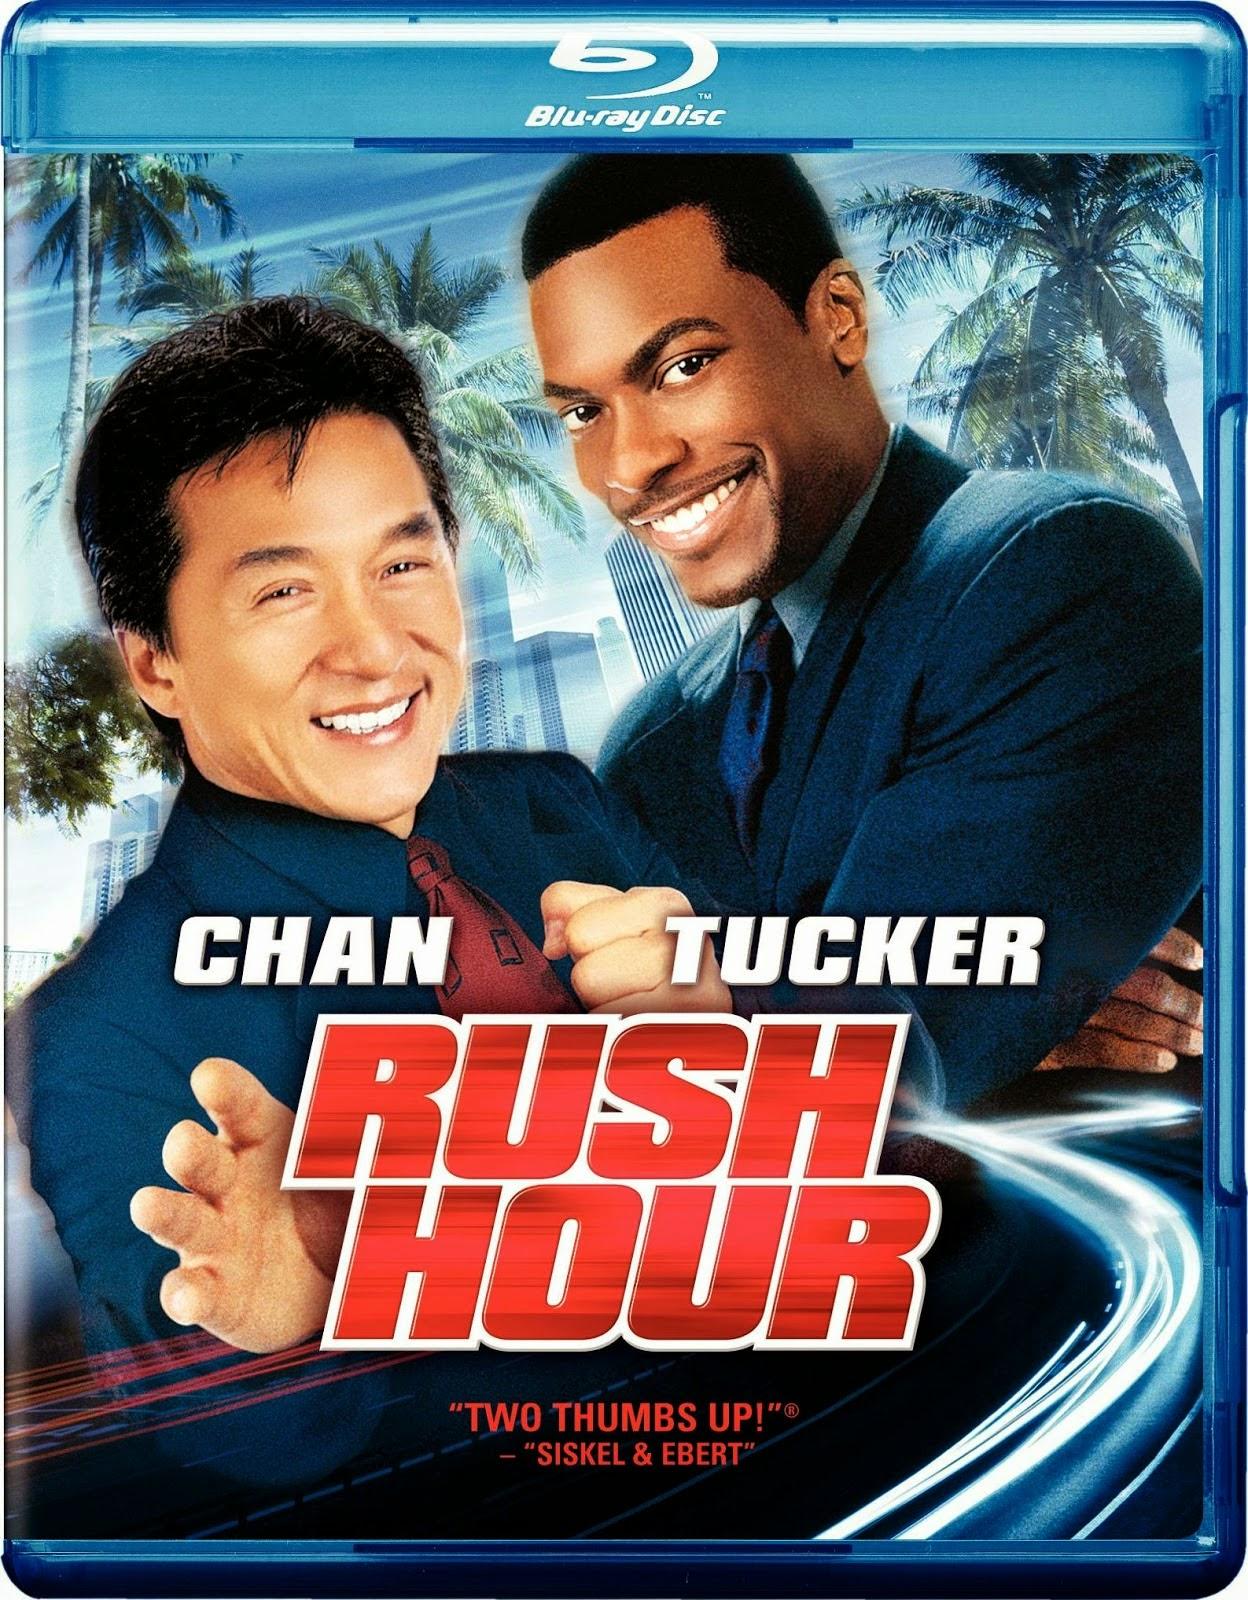 Rush Hour  1998  คู่ใหญ่ฟัดเต็มสปีด ภาค 1